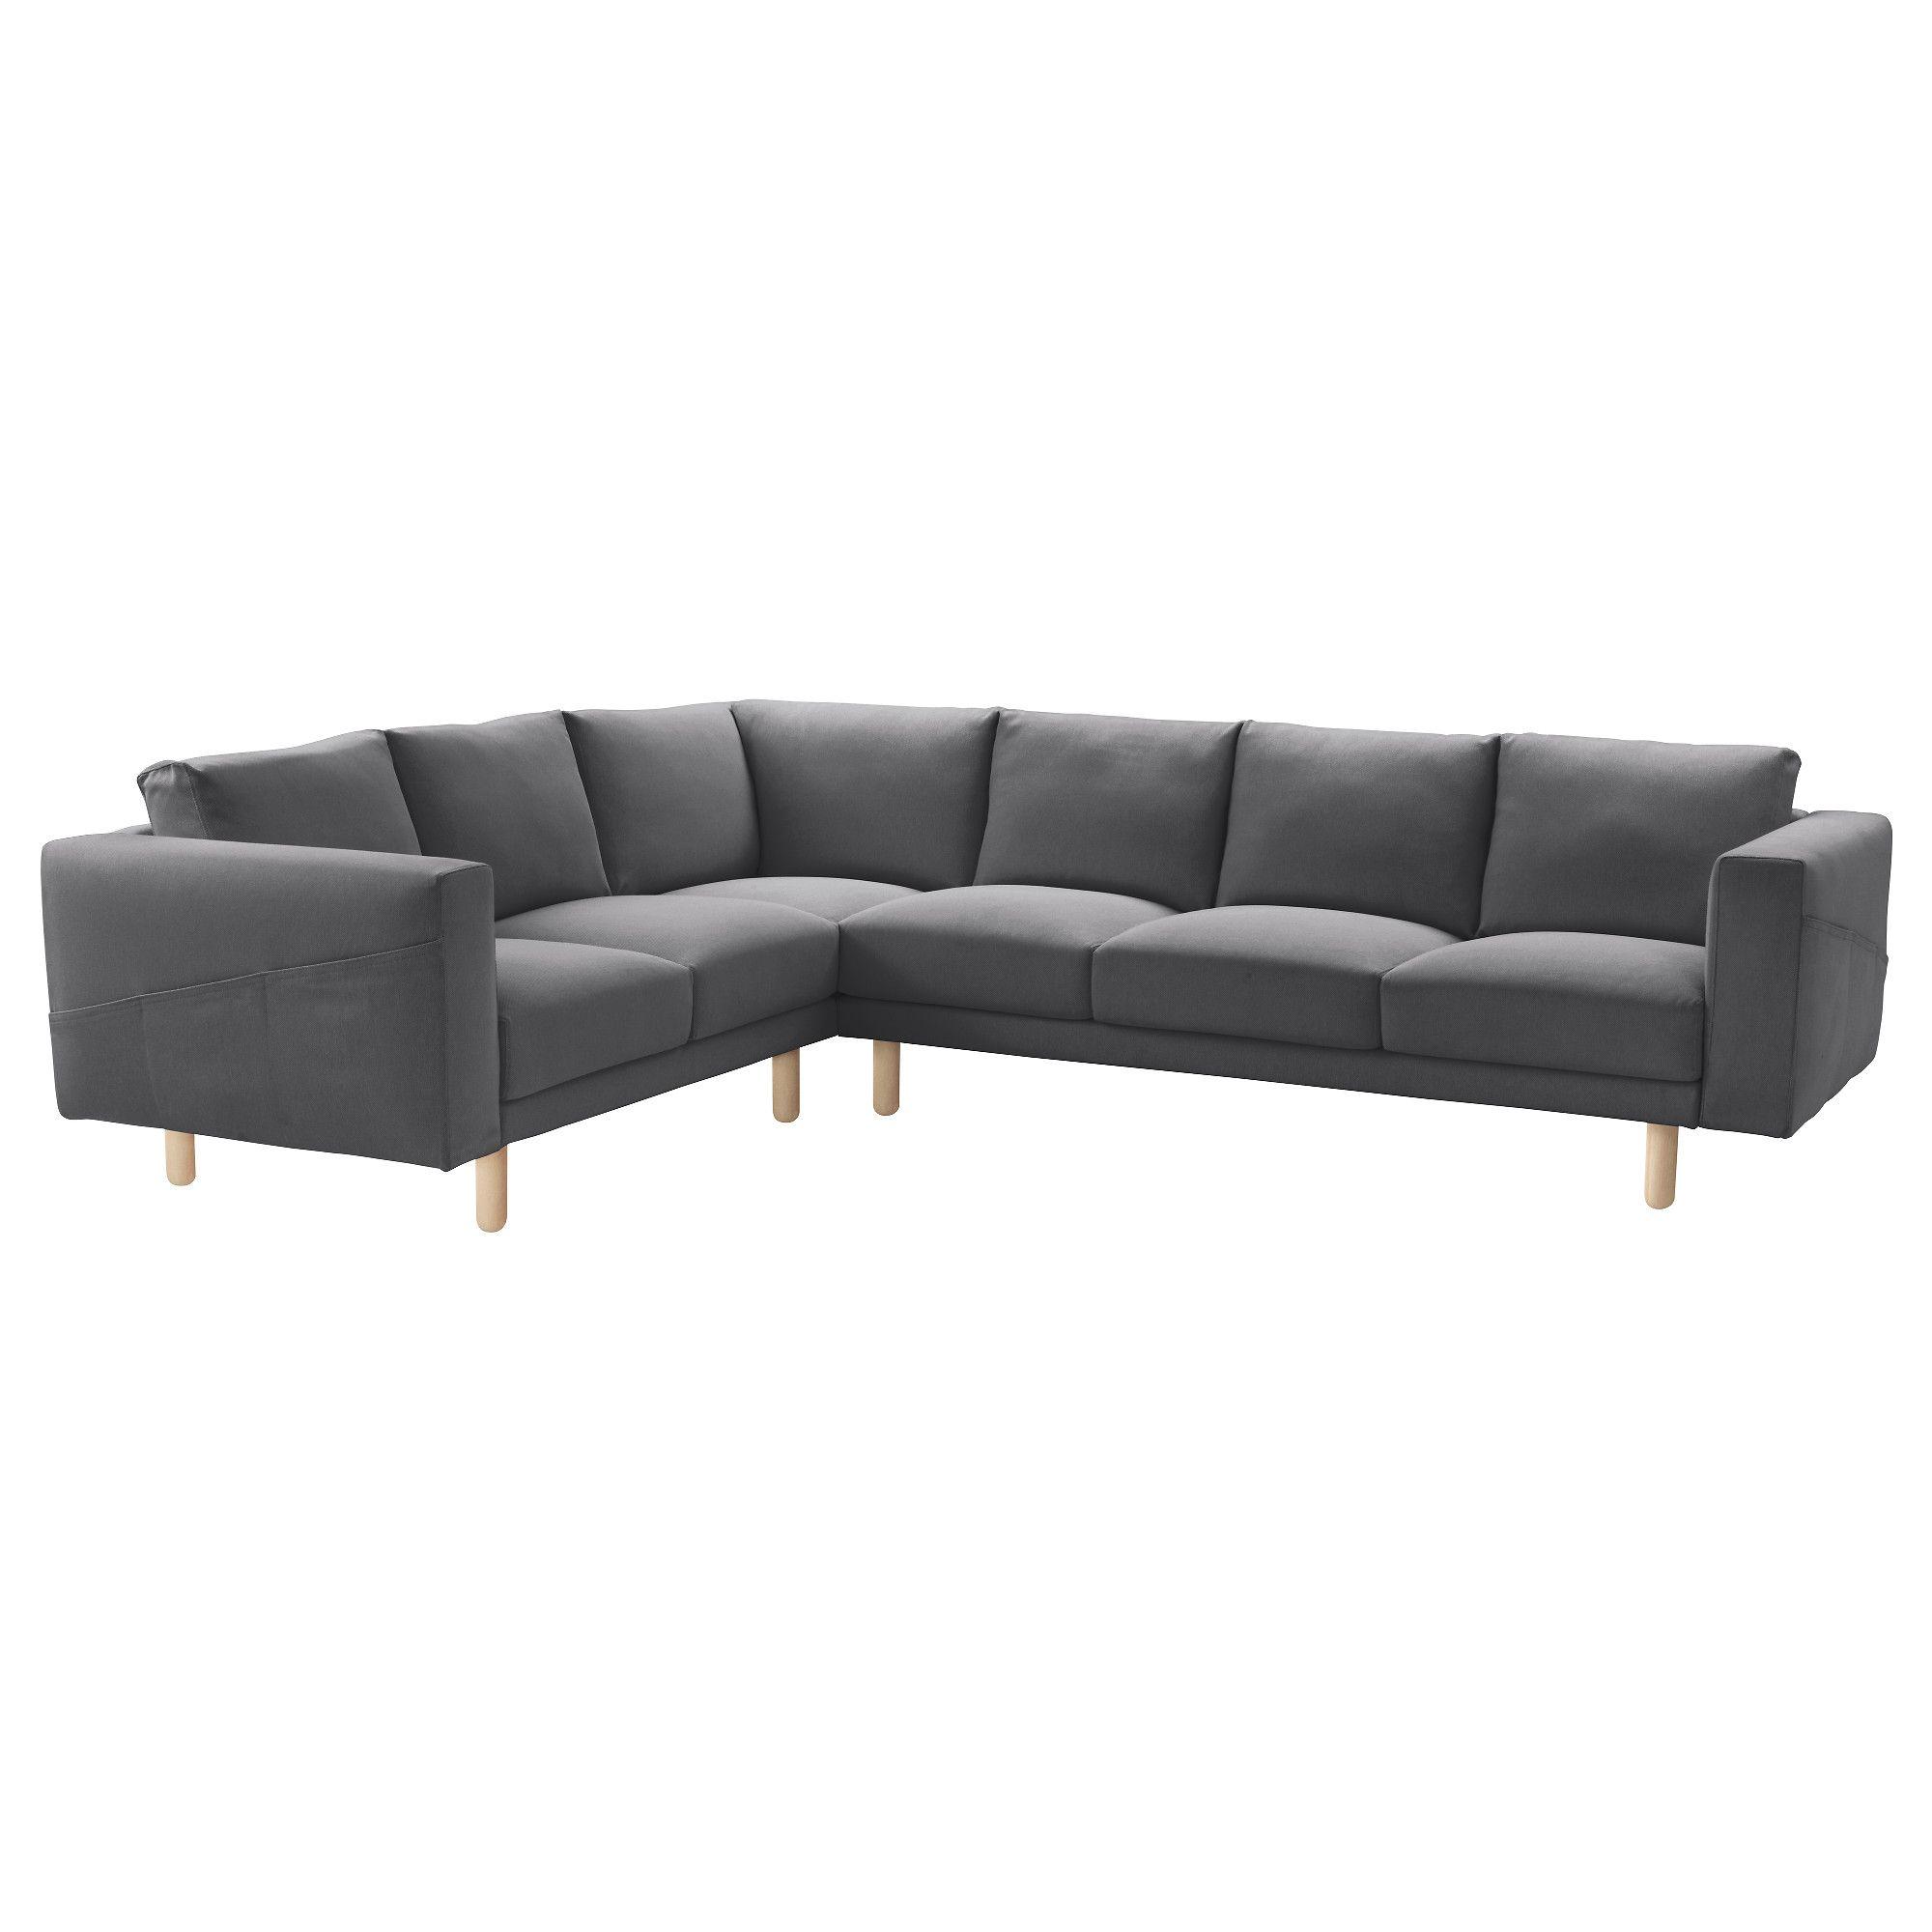 NORSBORG Corner sofa 2 3 3 2 Finnsta dark grey birch